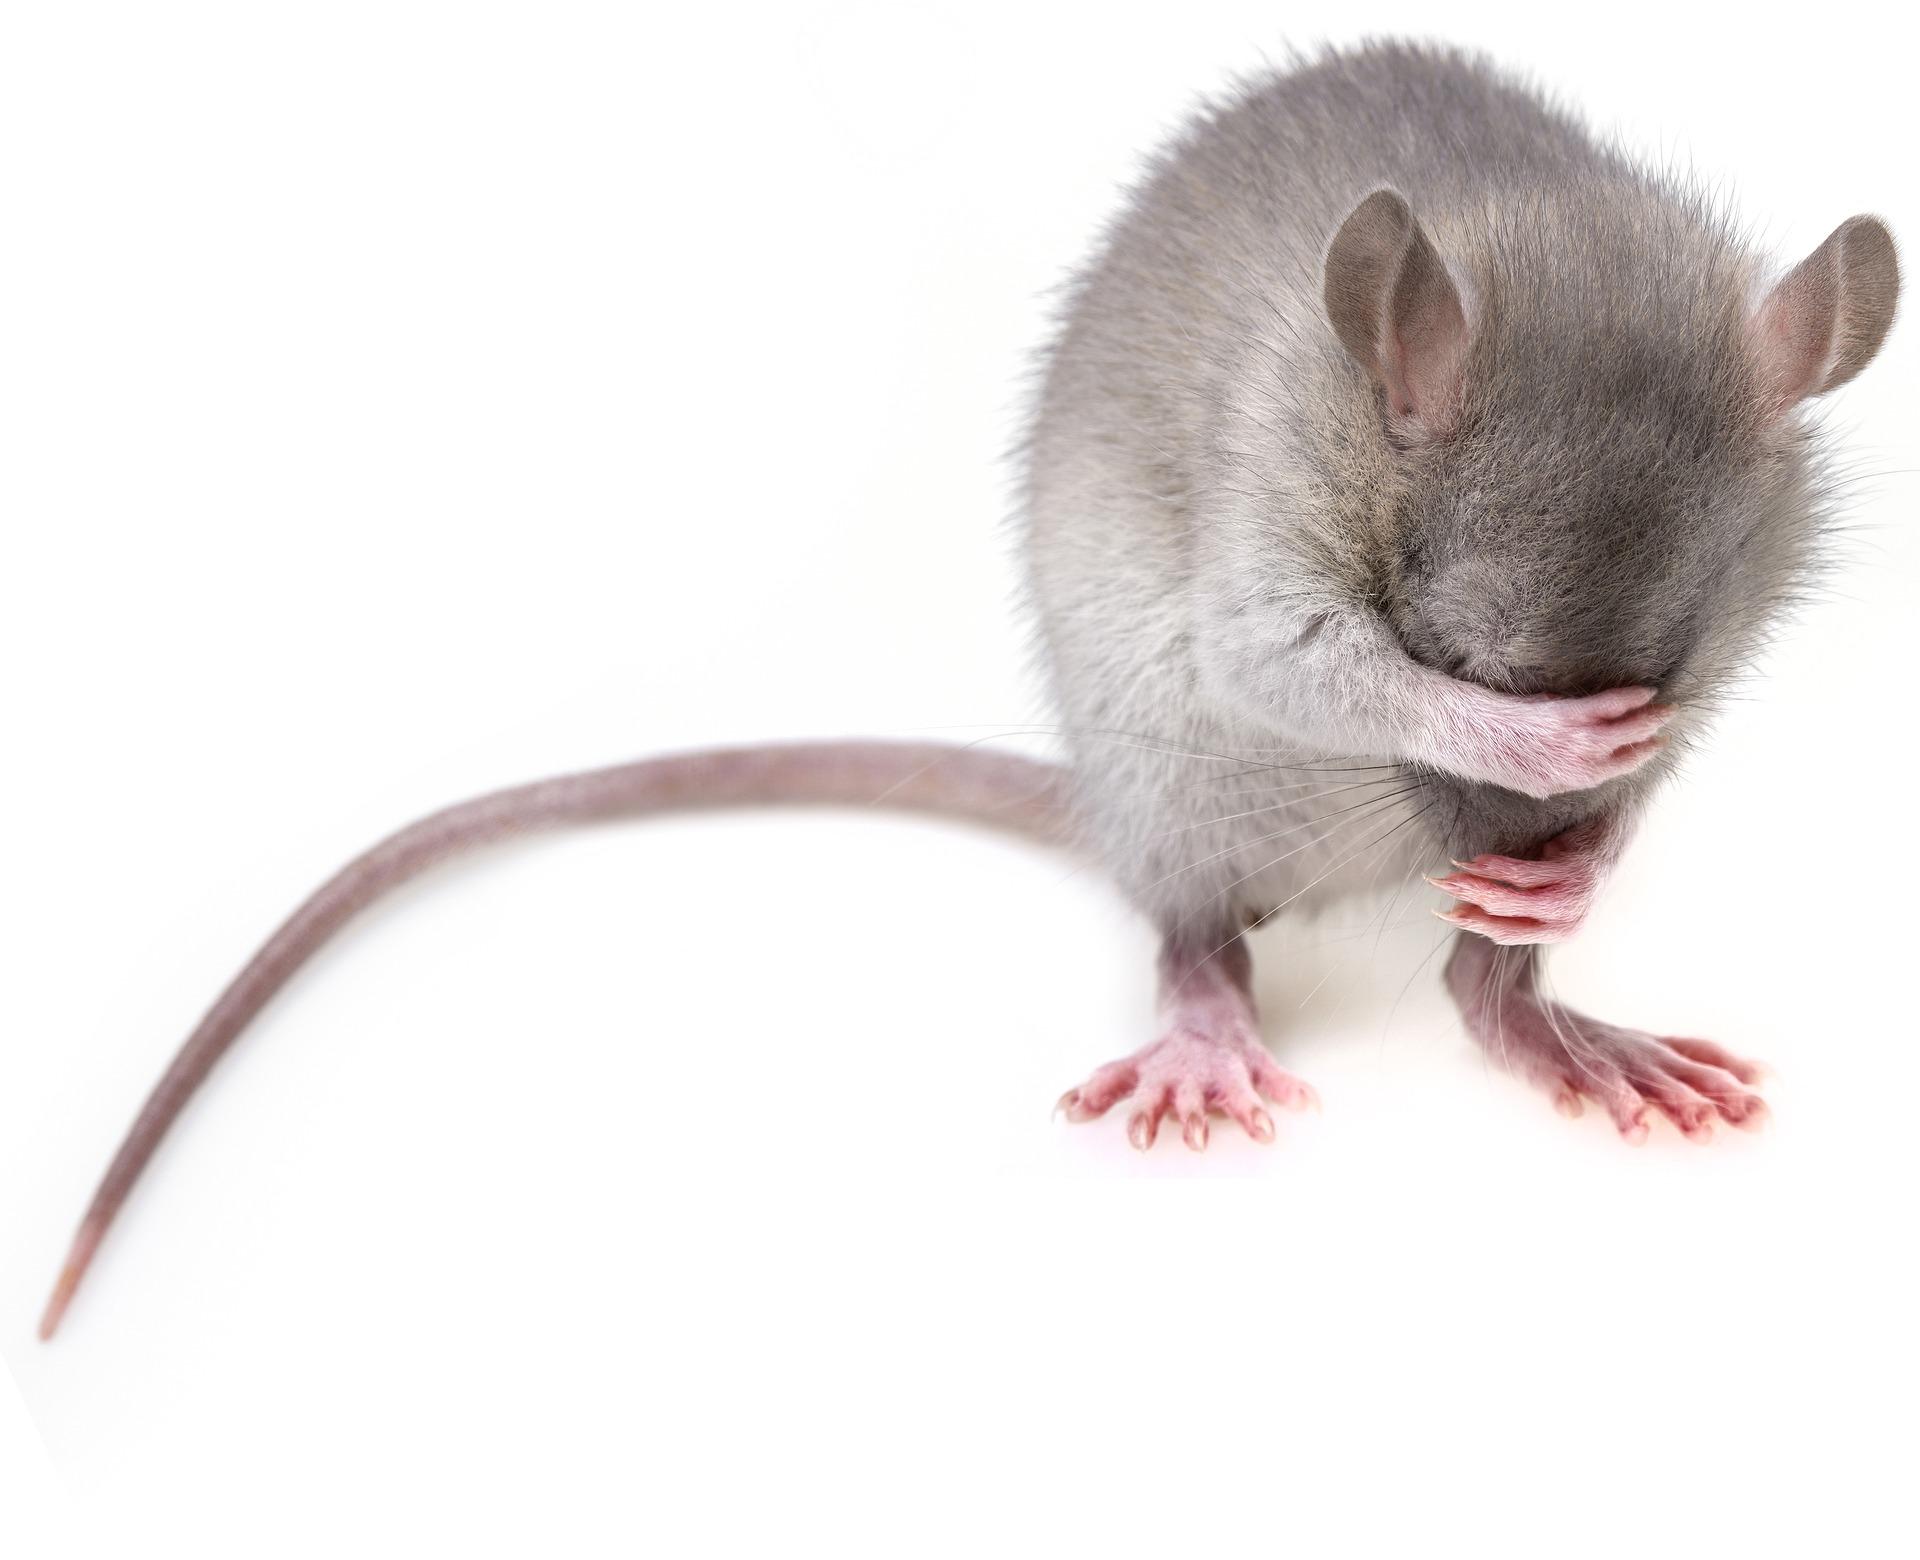 mouse-3194768_1920.jpg